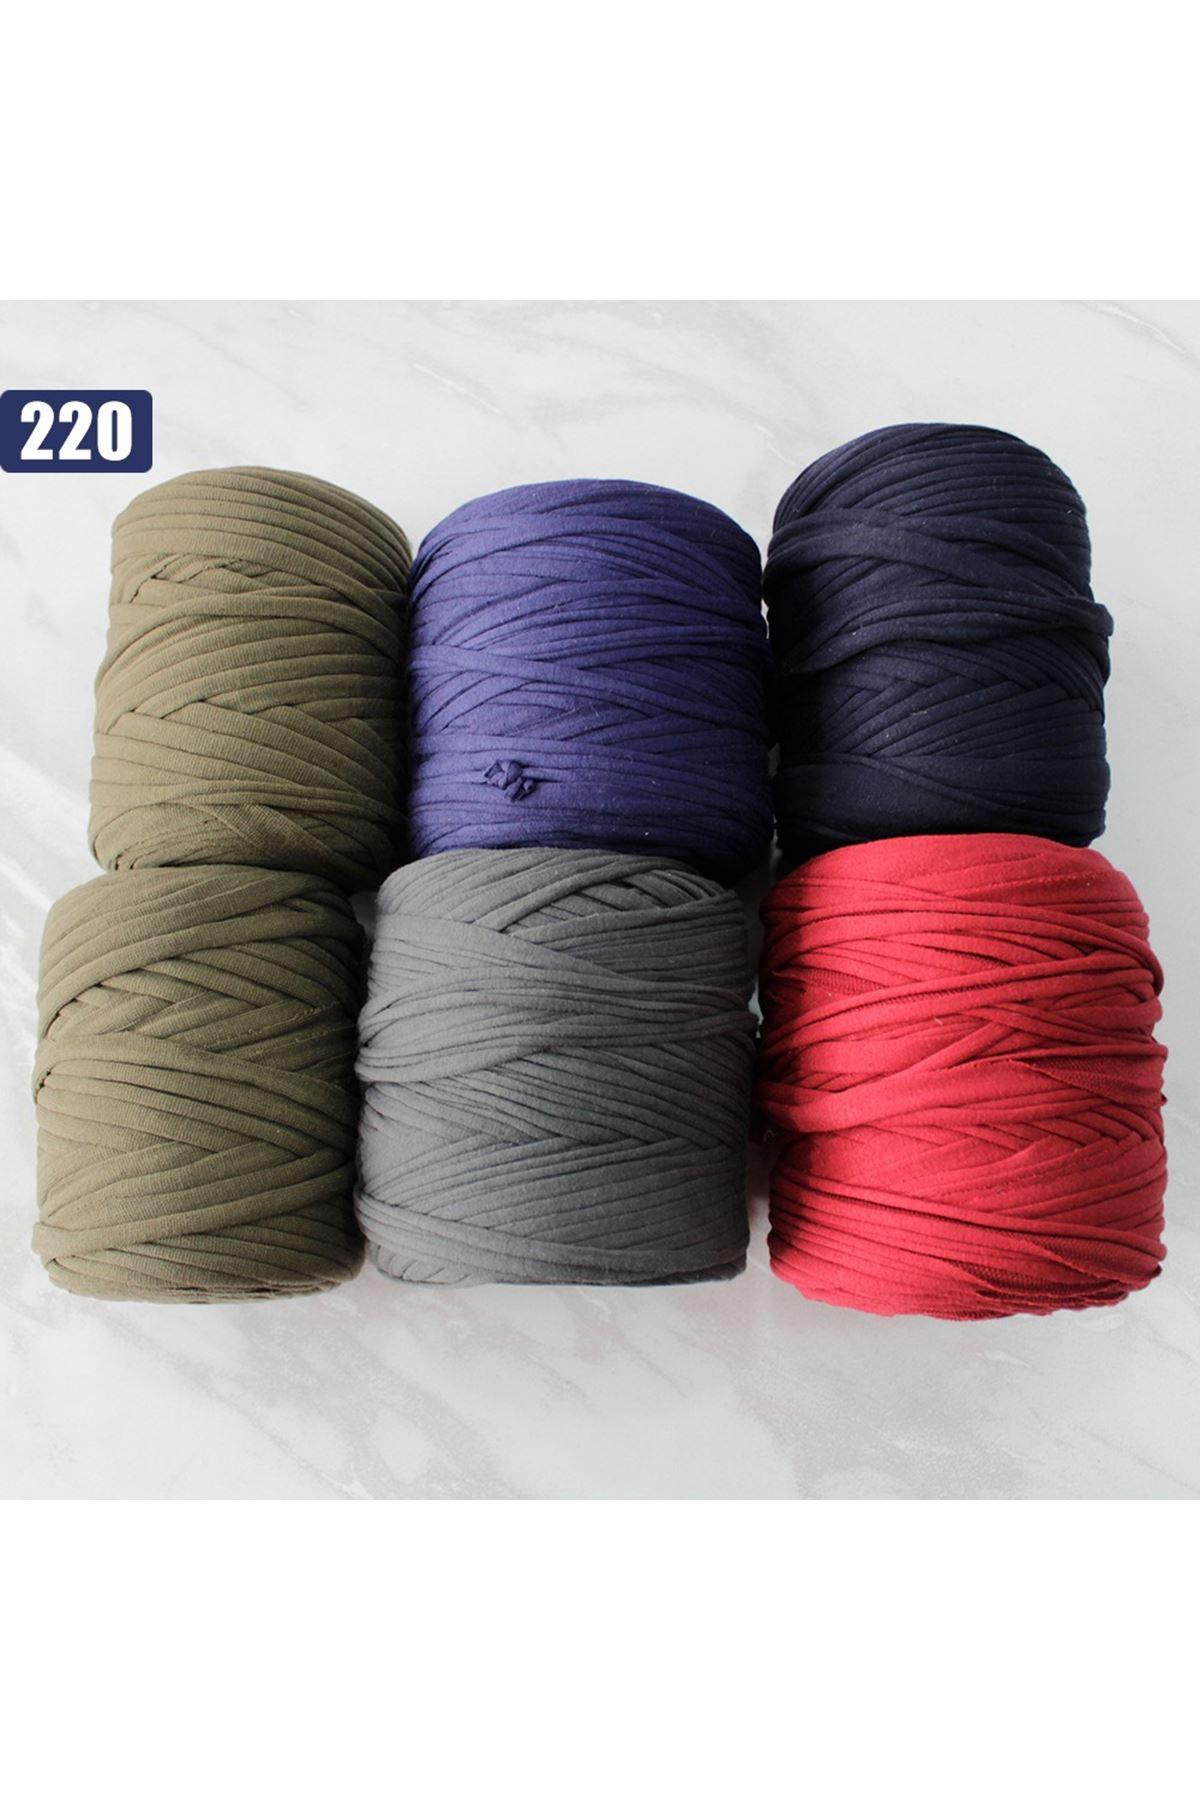 Penye 6'lı Grup 220